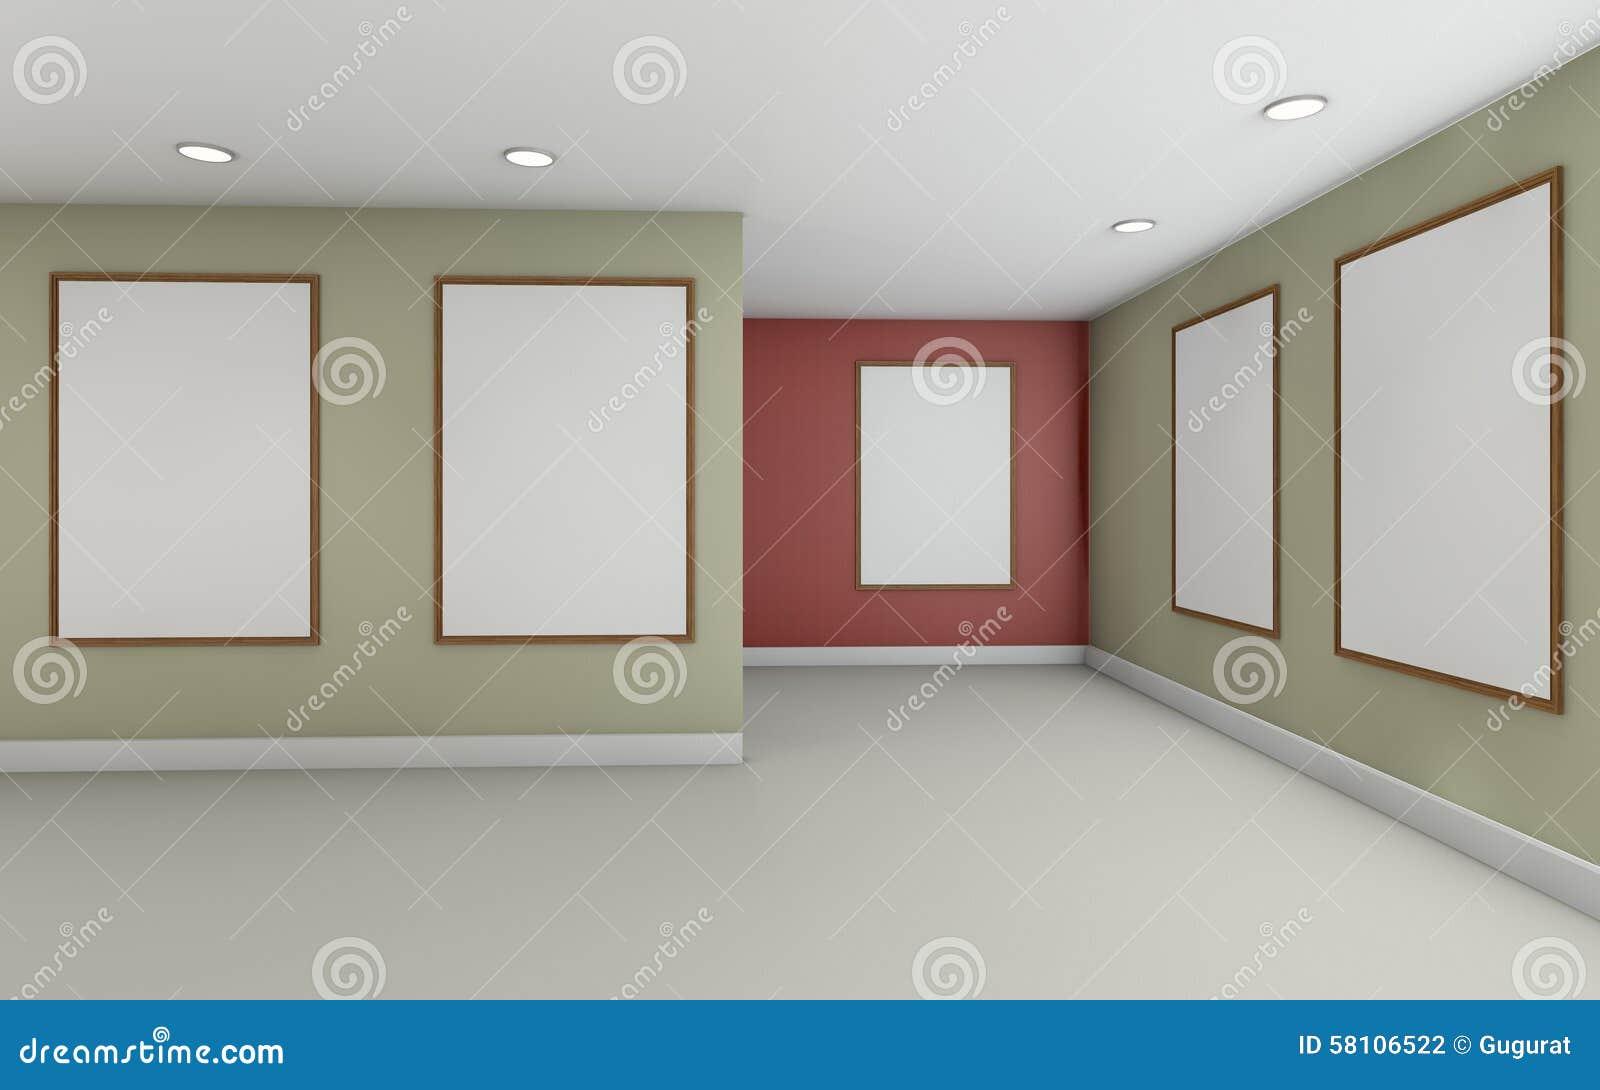 Color of art gallery walls - Art Color Frame Gallery